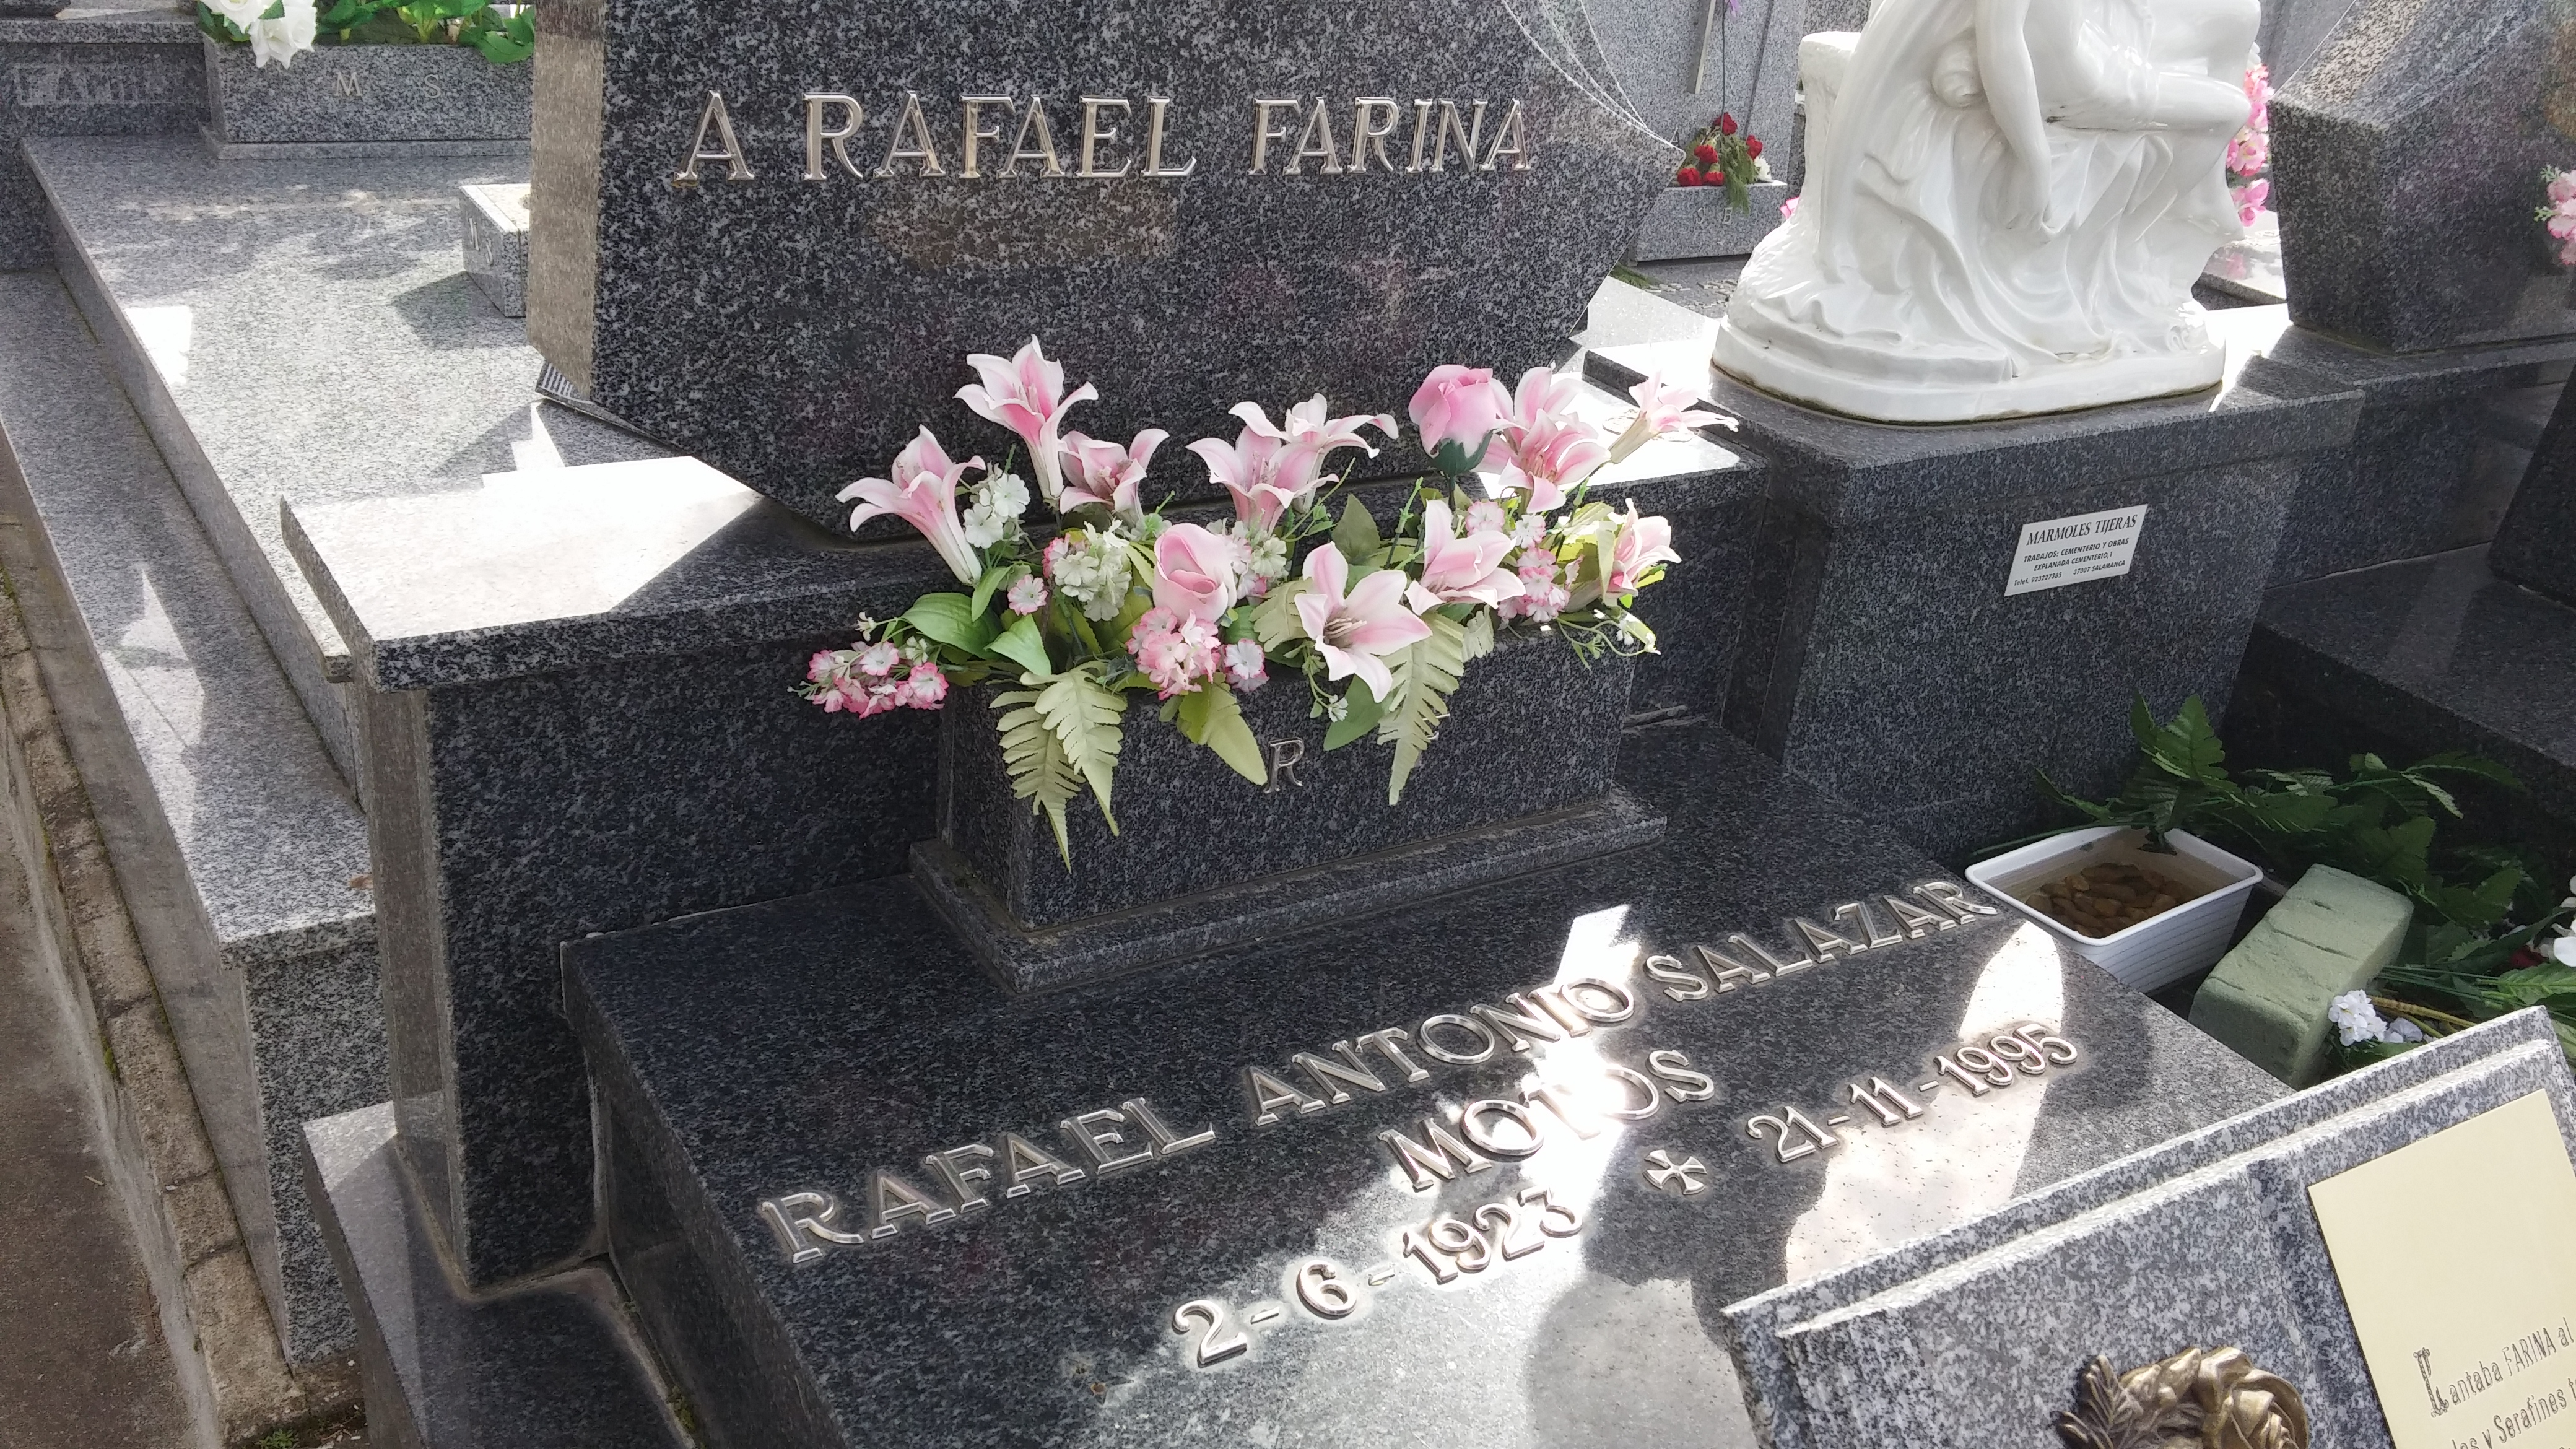 Tumba de Rafael Farina en el cementerio de Salamanca.